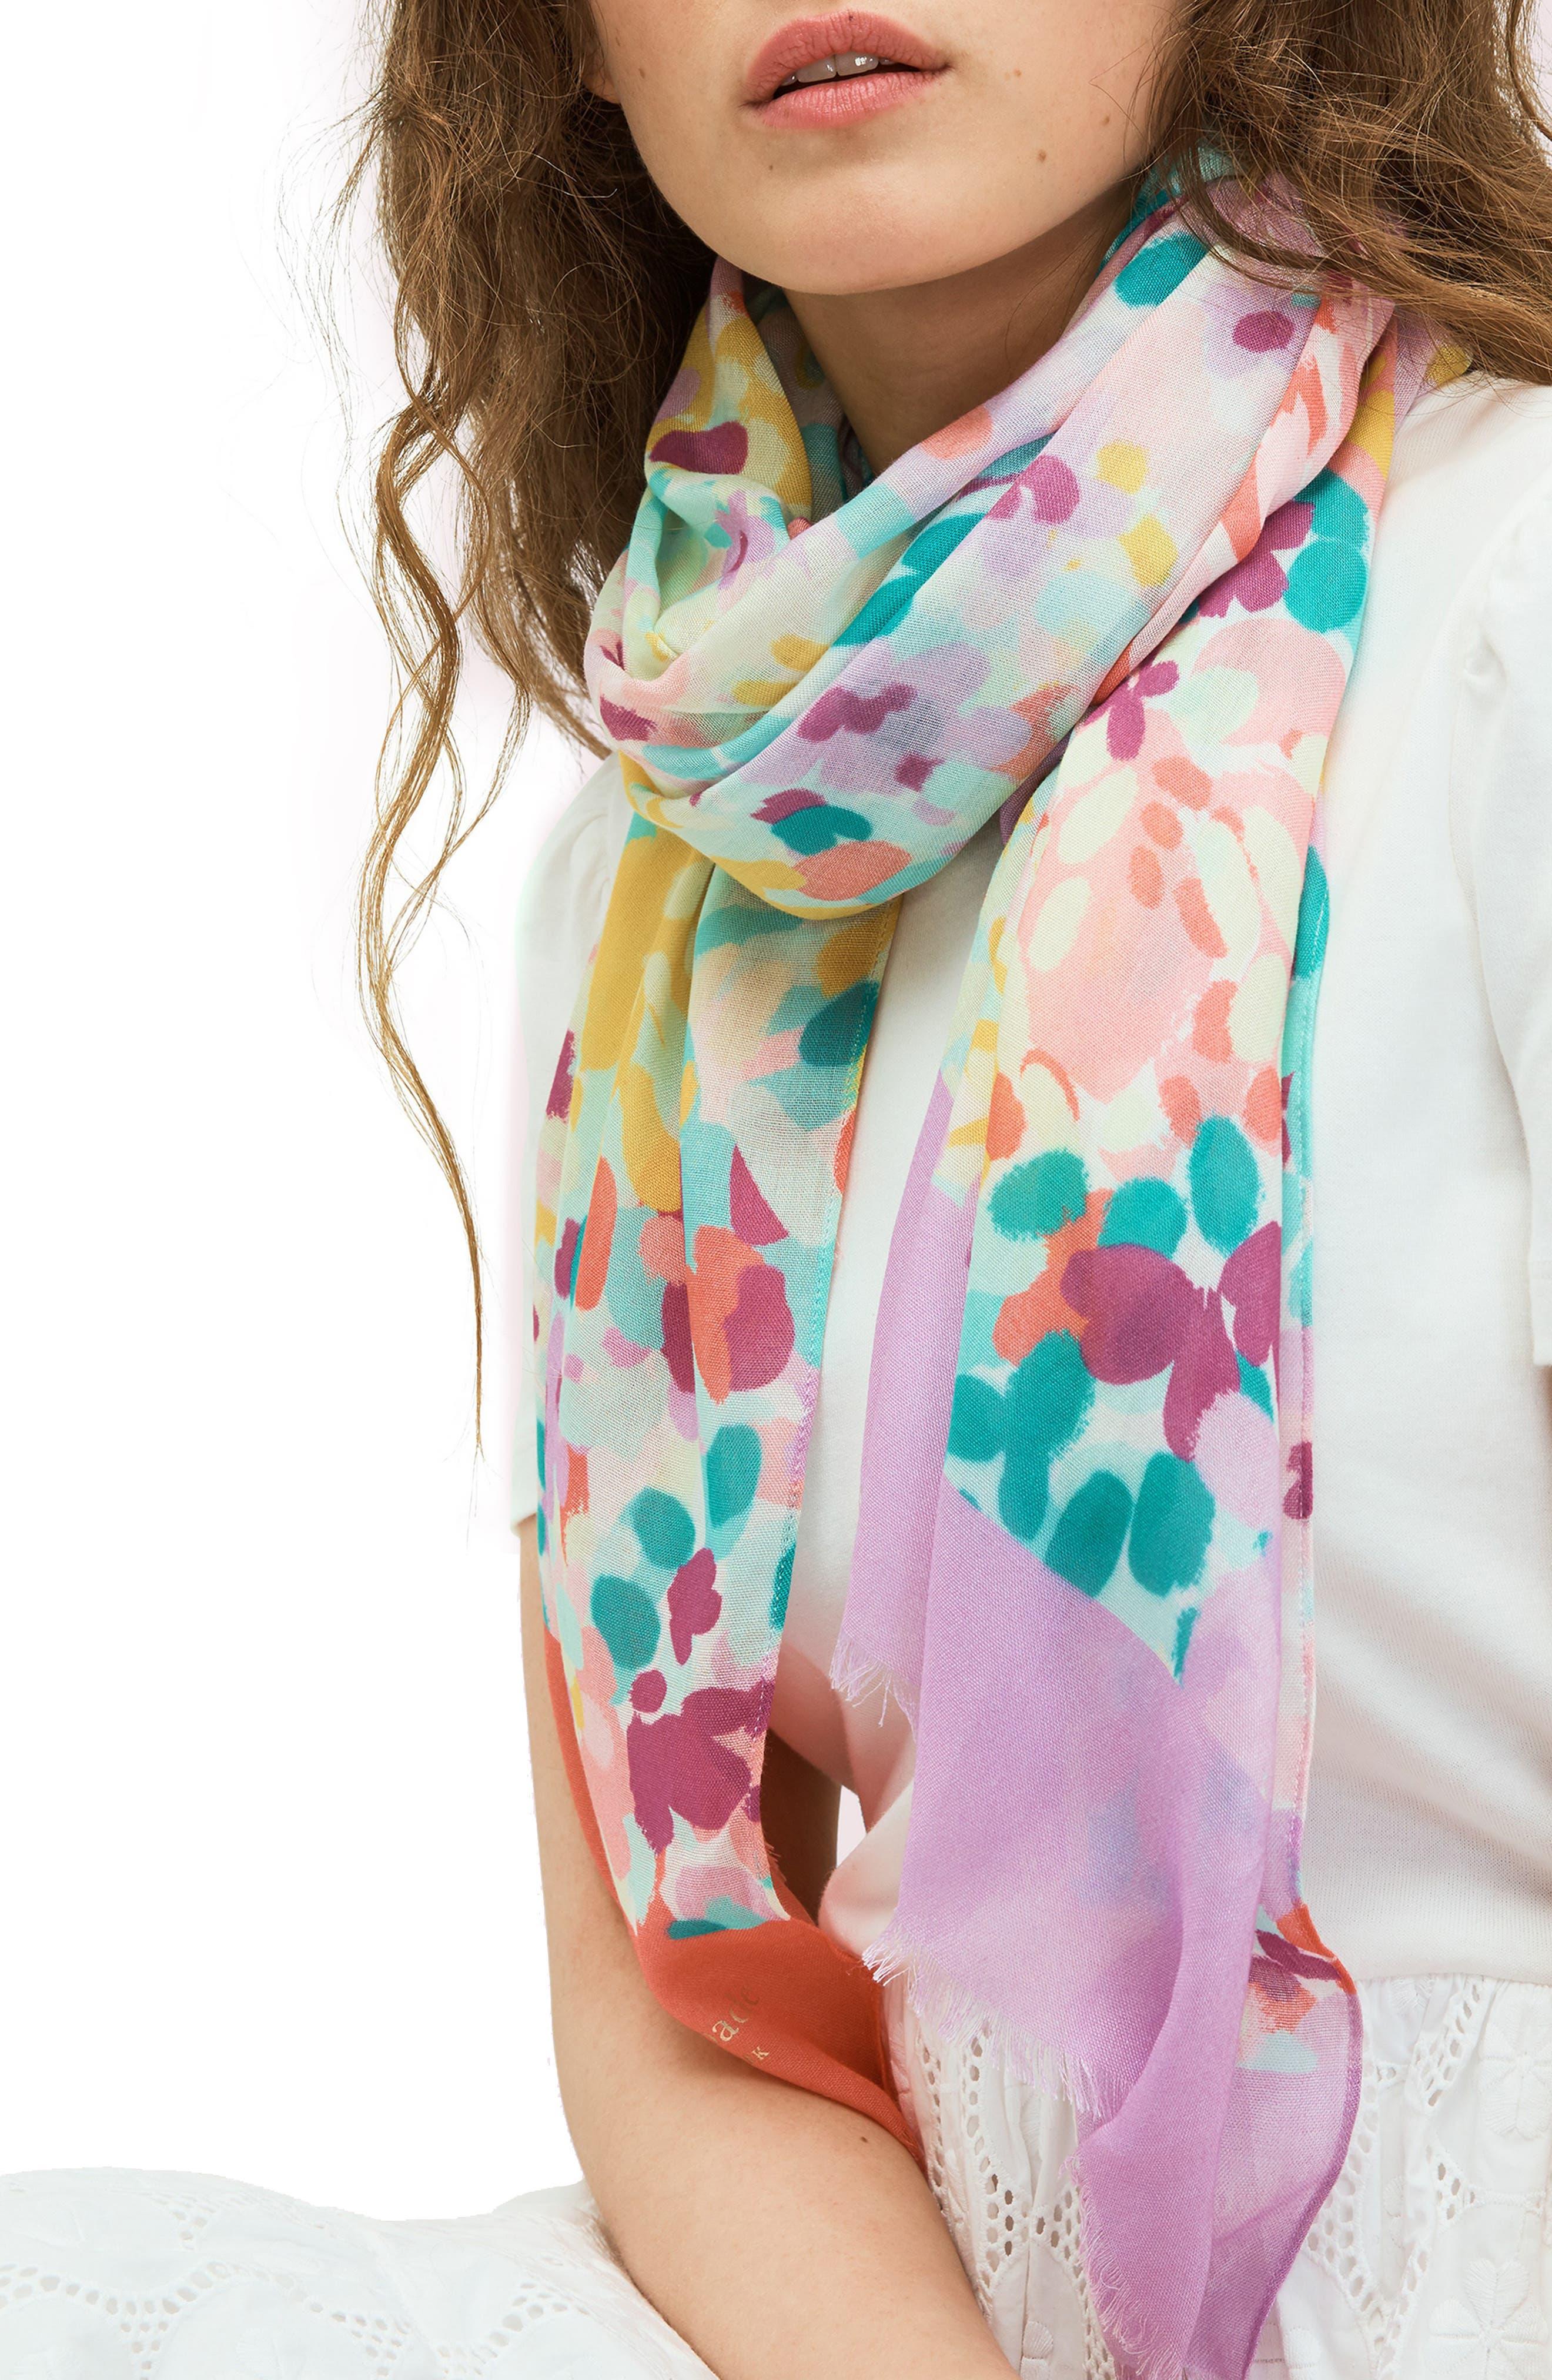 kate spade new york Women's Kate Spade New York Watercolor Garden Silk Scarf, Size One Size - Pink